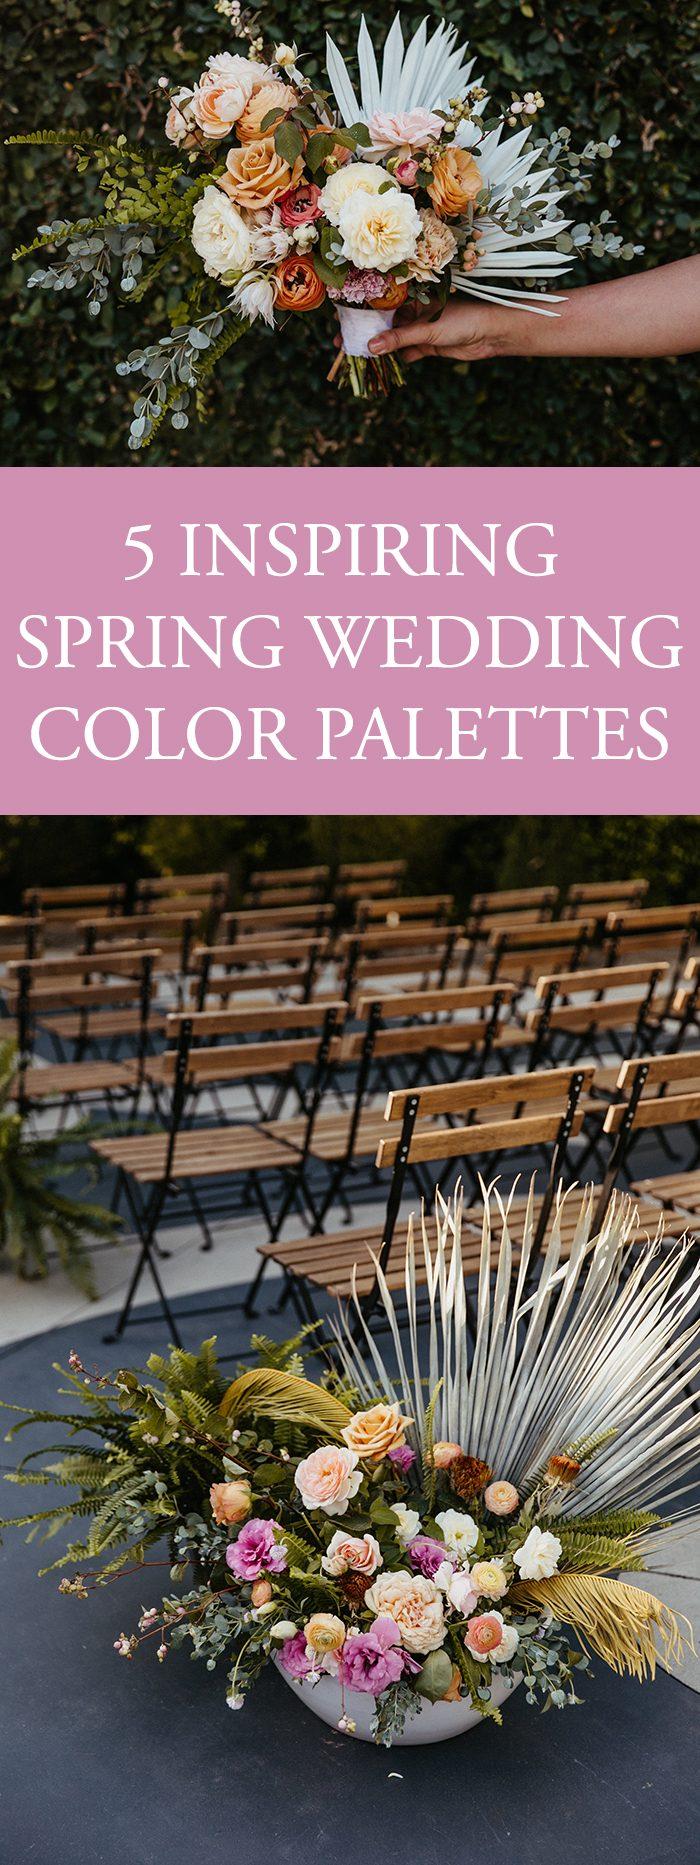 wedding colors Wedding Blog Posts - Archives | Junebug Weddings